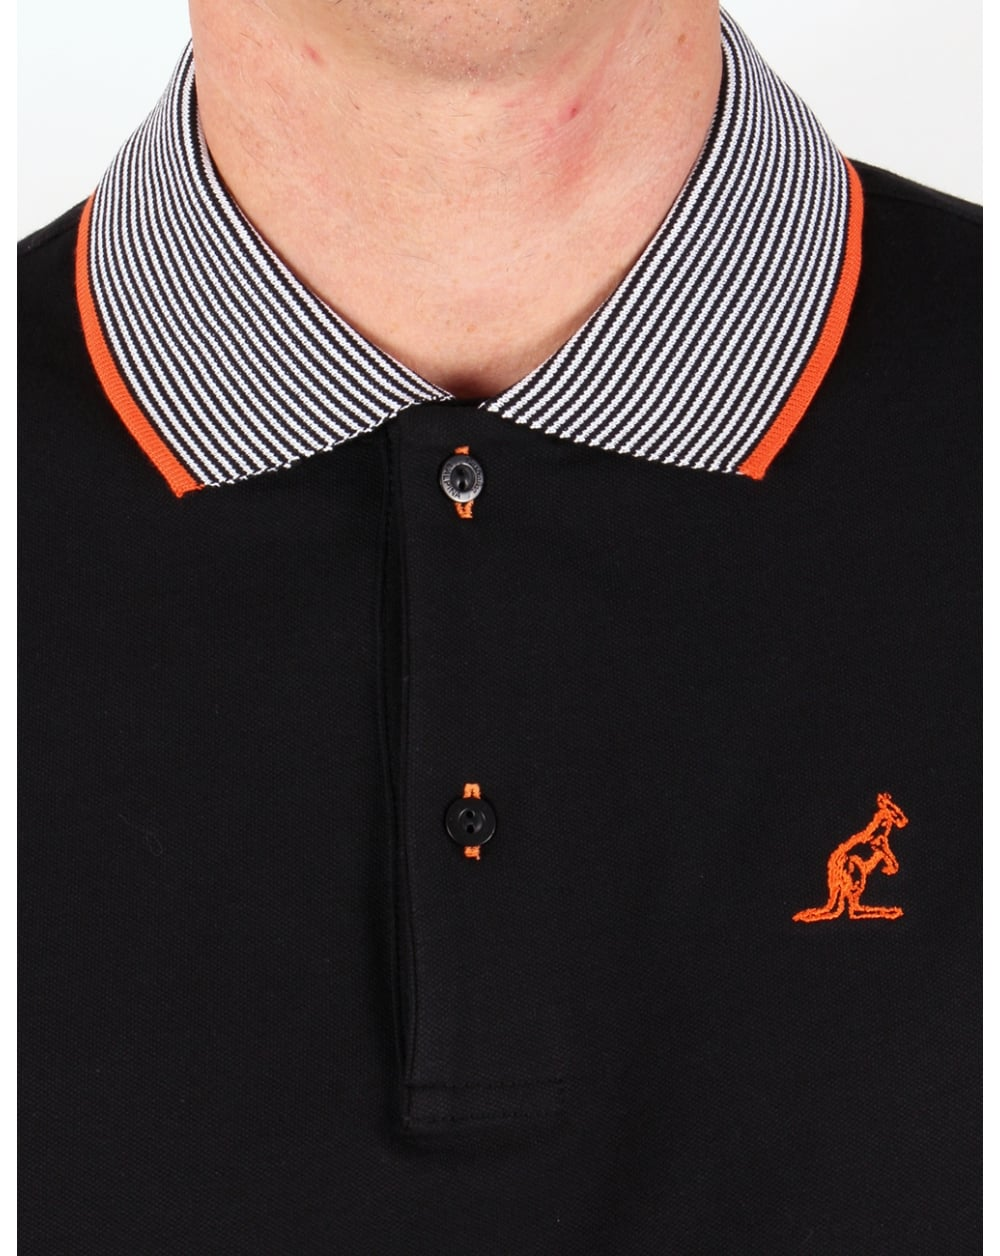 Australian By Lalpina Striped Collar Polo Shirt Black Mens Pique